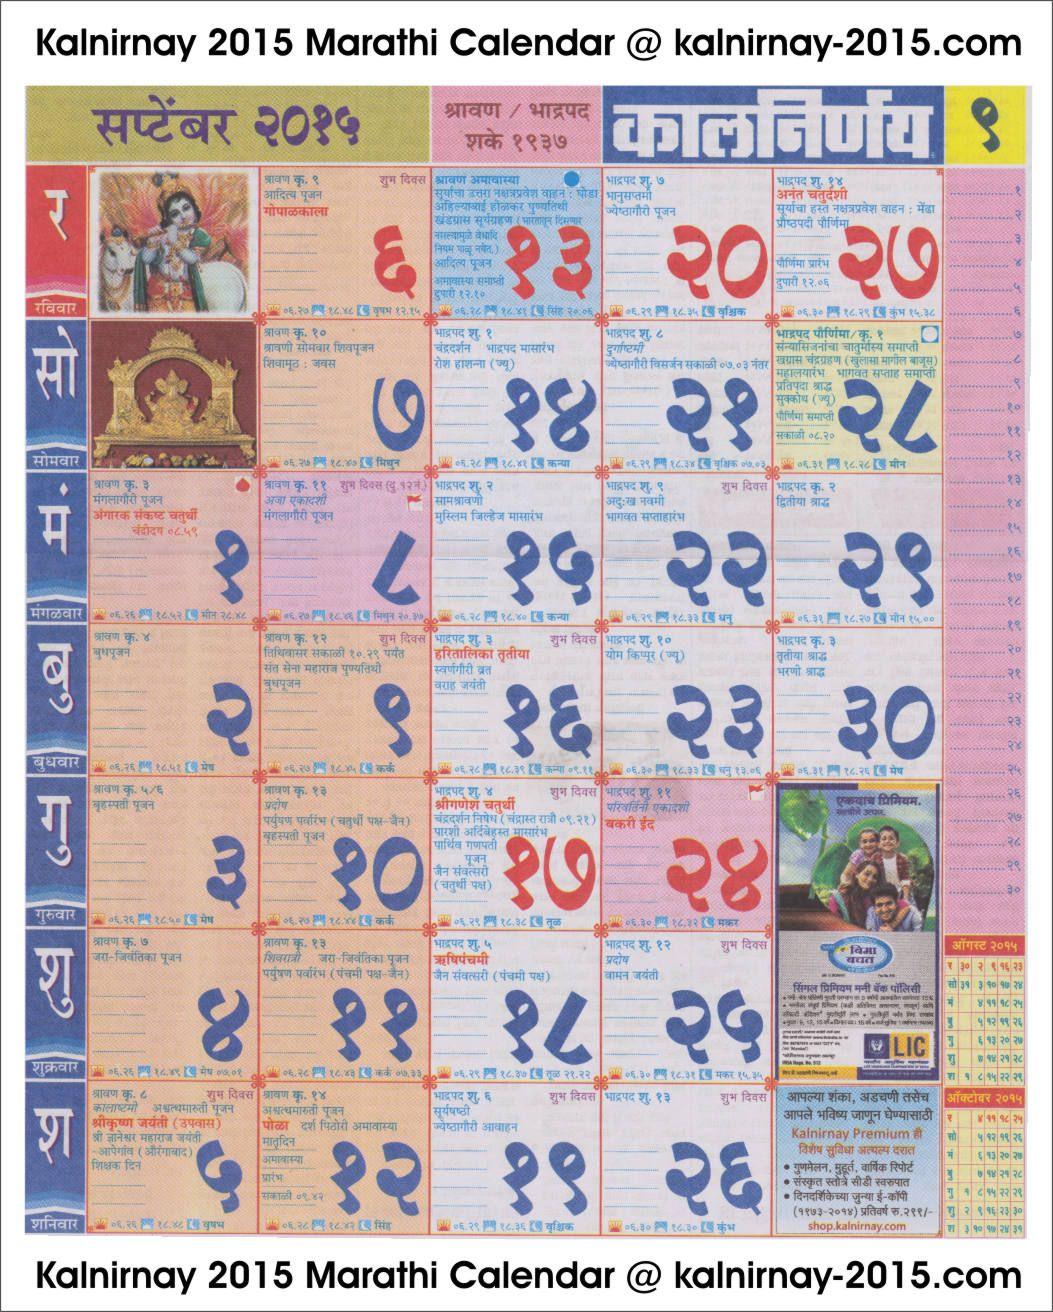 May Marathi Calendar : September marathi kalnirnay calendar